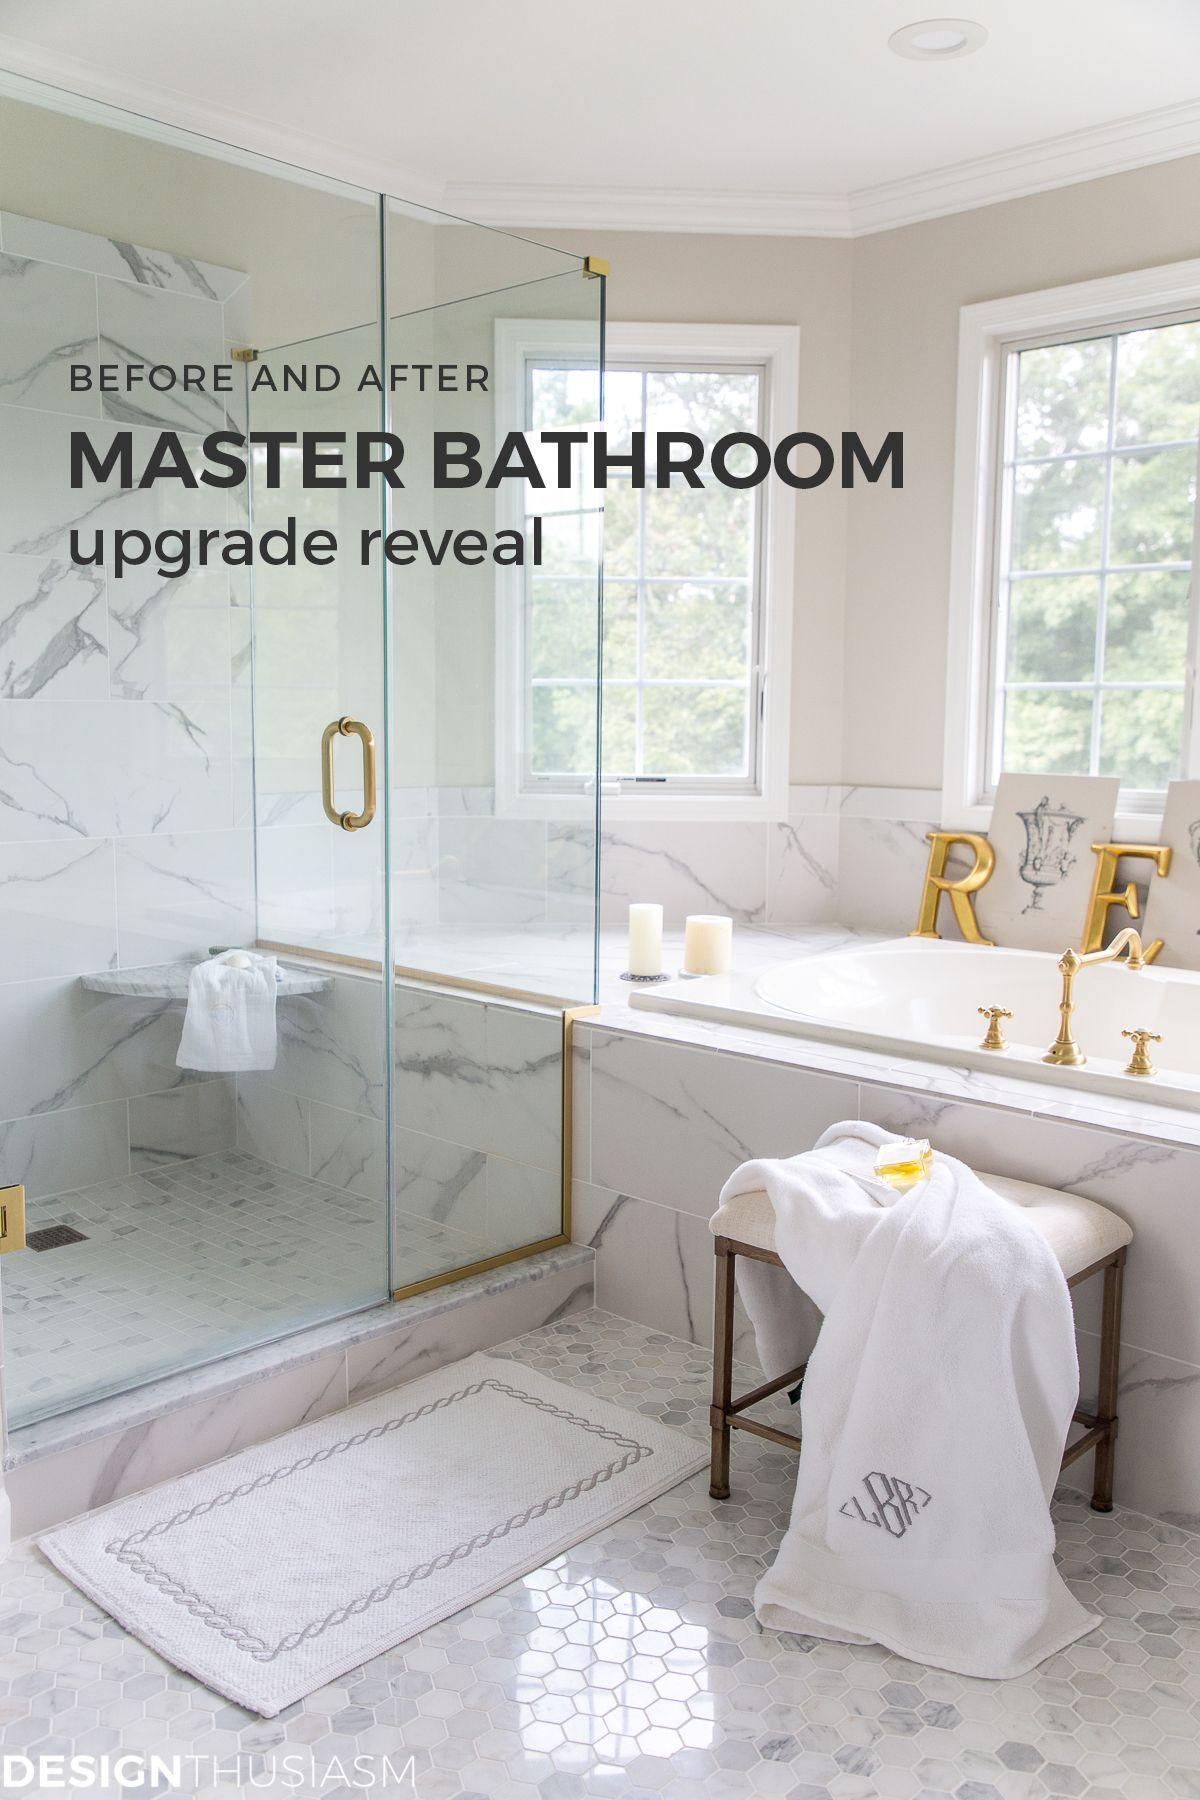 Master Bathroom Reveal New Bathroom Makeover Before And After Master Bathroom Bathroom Design Master Bathroom Upgrade